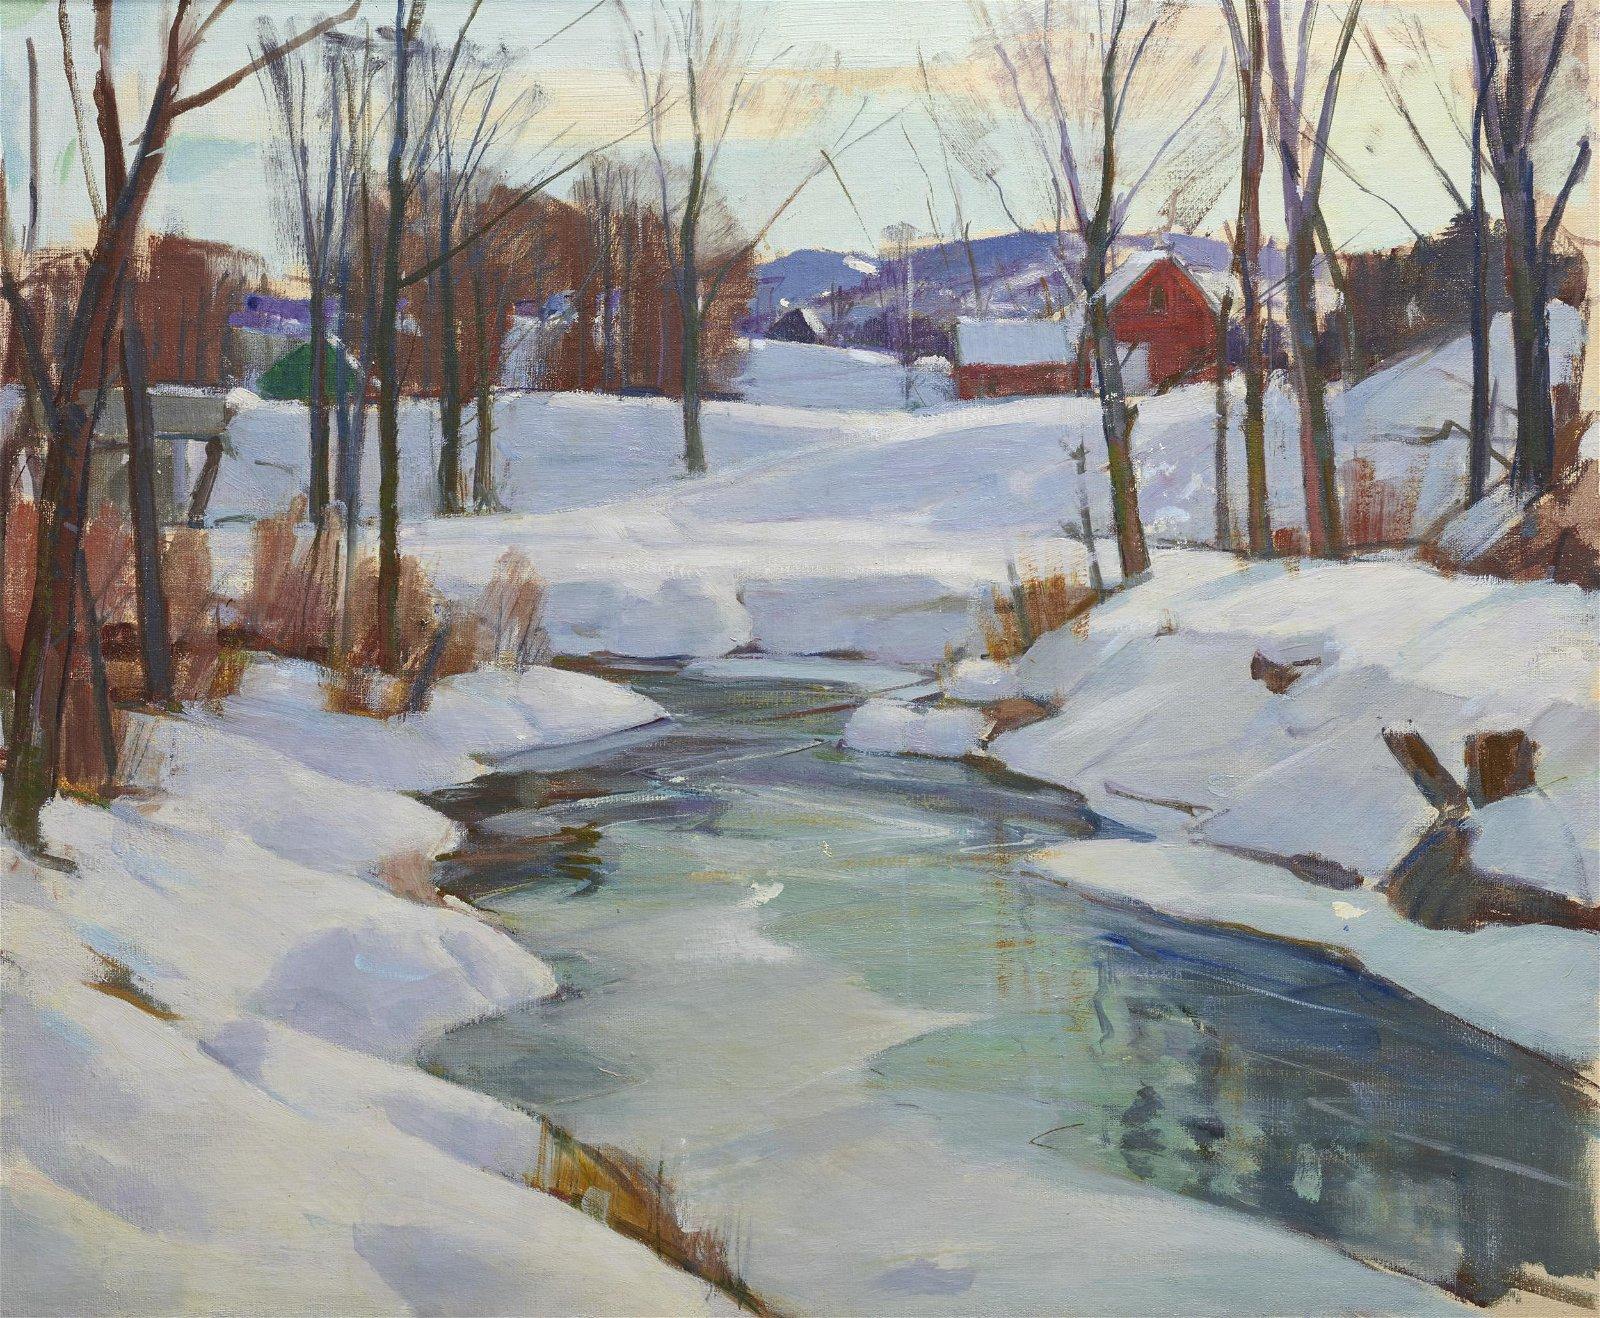 CARL PETERS, (American, 1897-1980), Winter Stream, oil